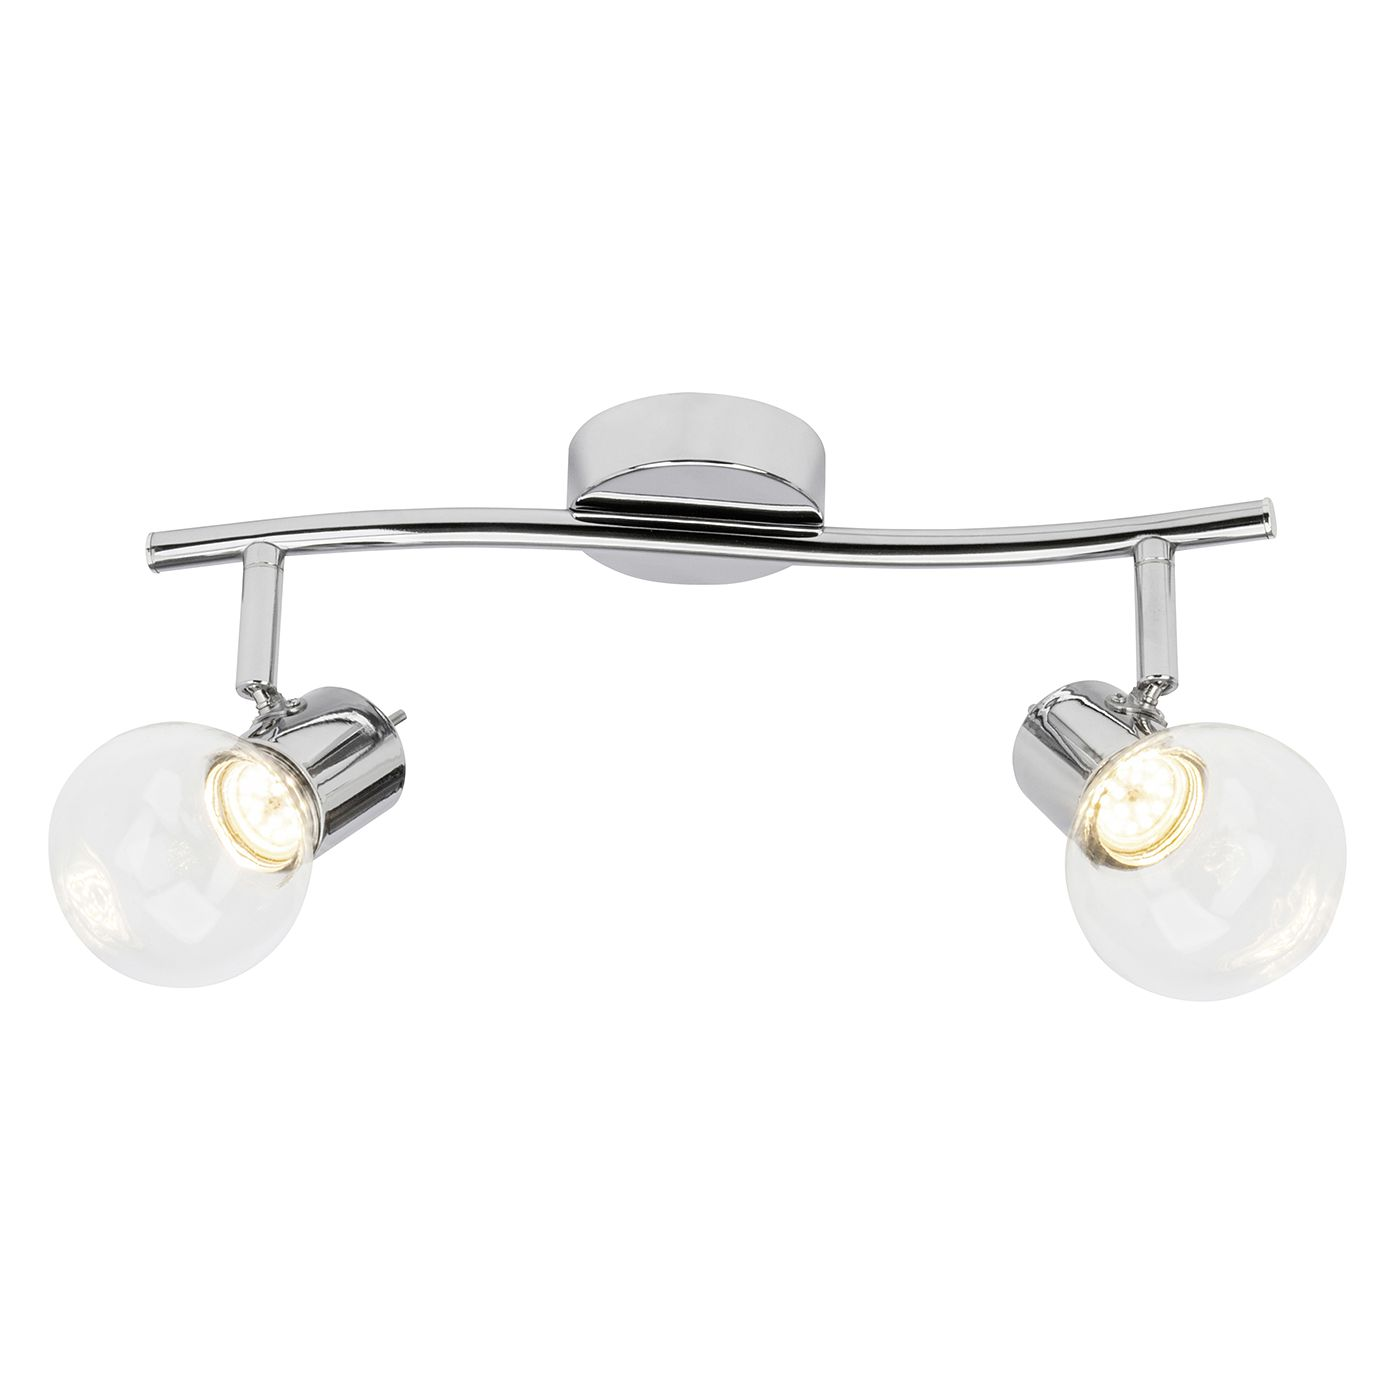 LED-Deckenleuchte Celest